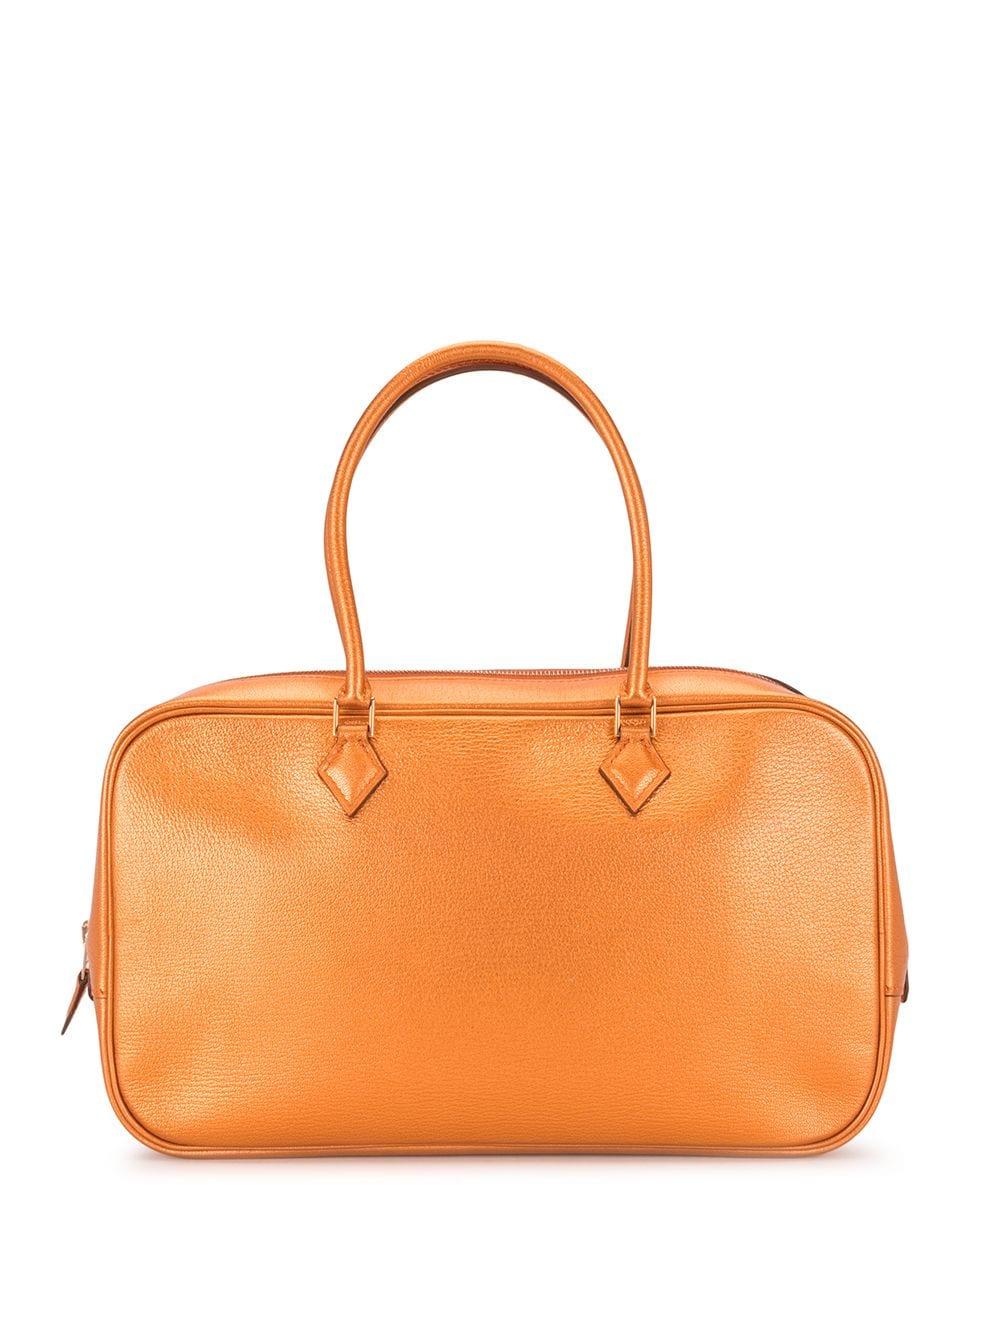 Hermès 2006 pre-owned Plume Handtasche, 28cm - Gold